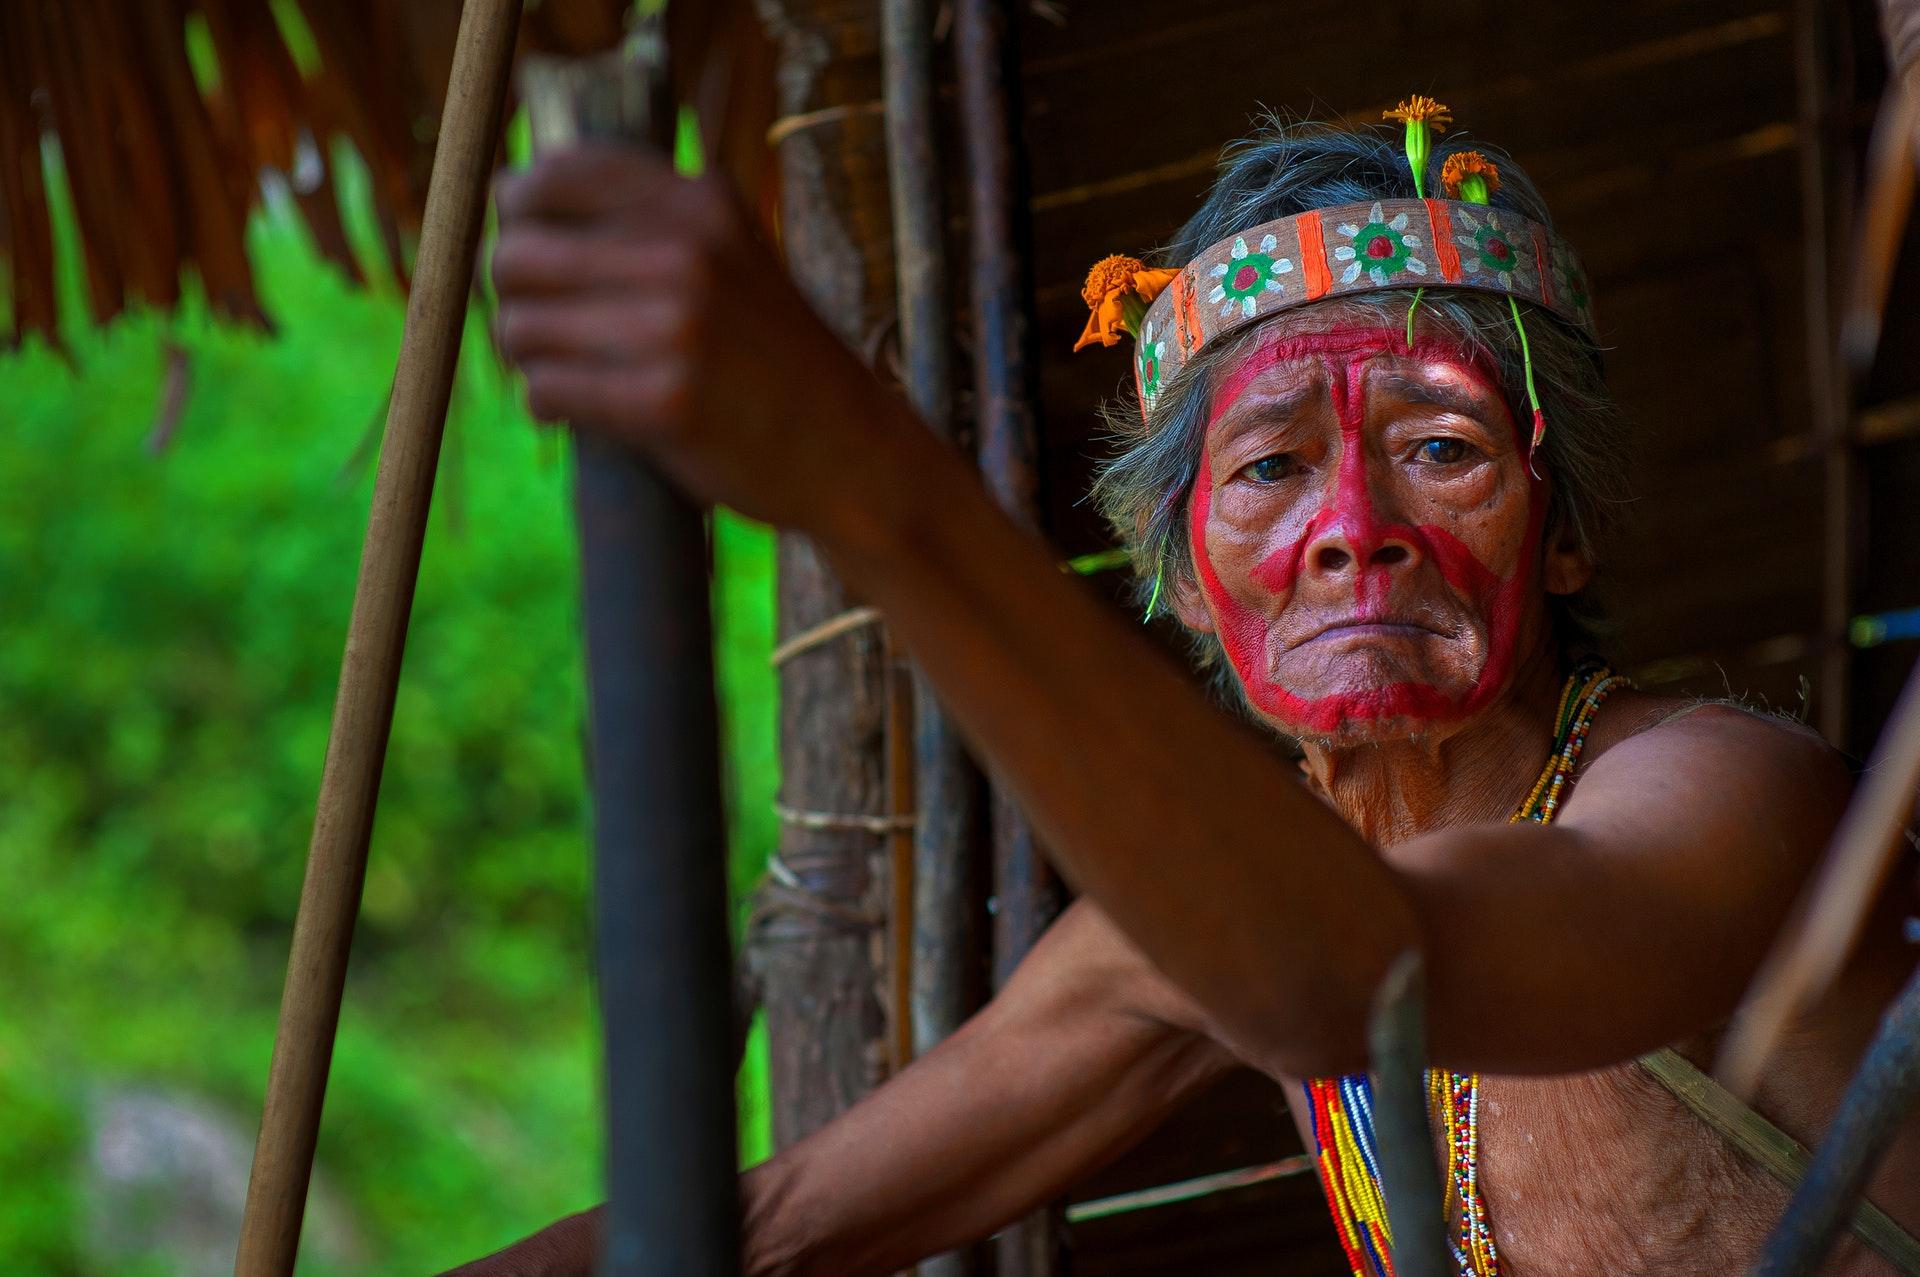 tribesman.jpeg